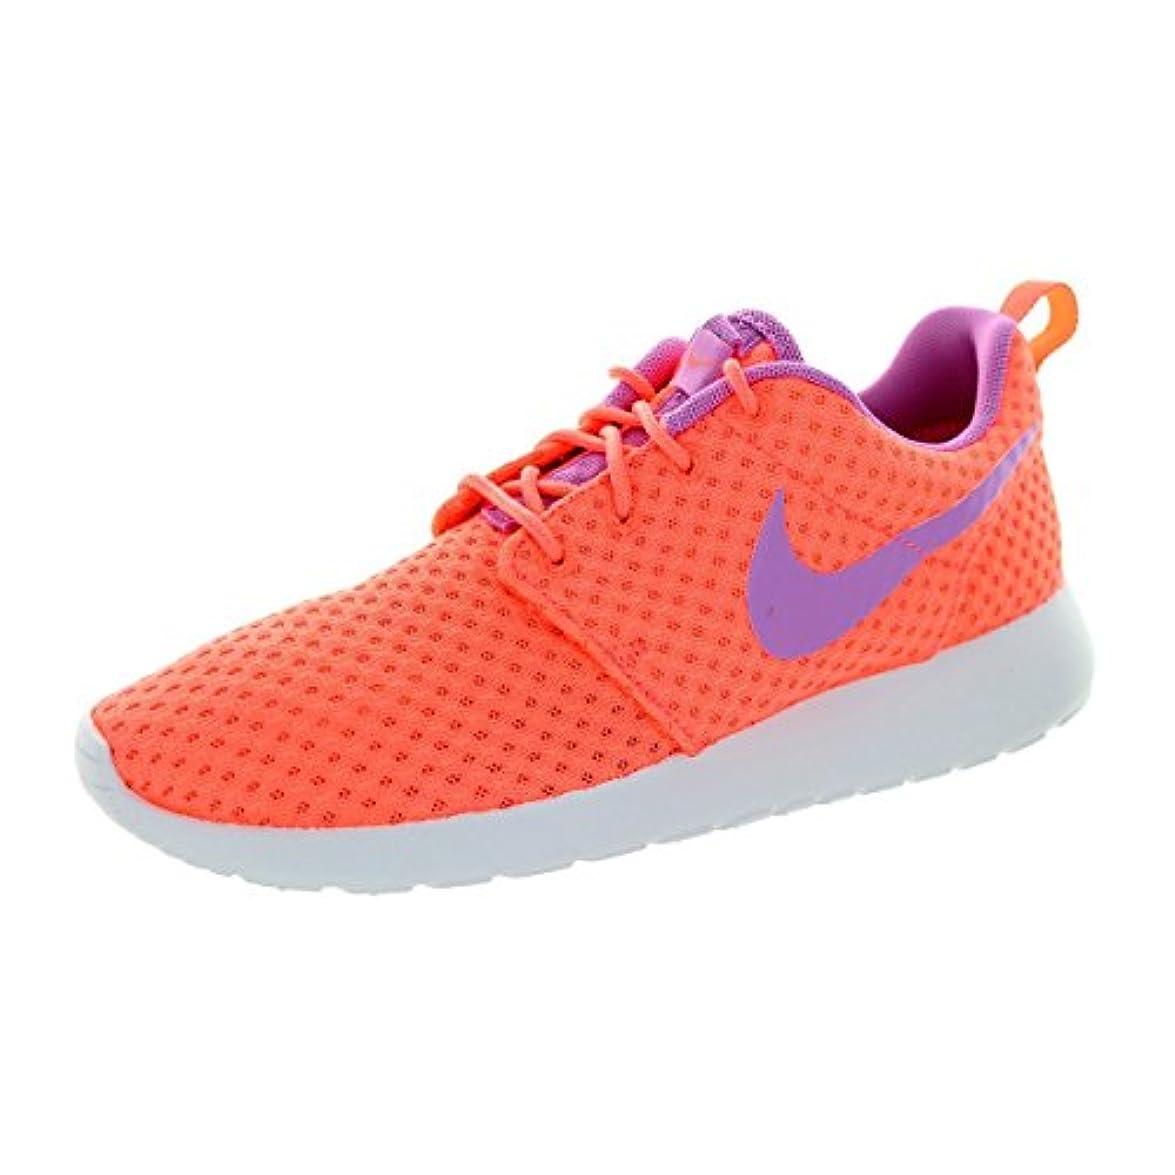 Nike Scarpe Da Ginnastica One Roshe Ref 724850 661